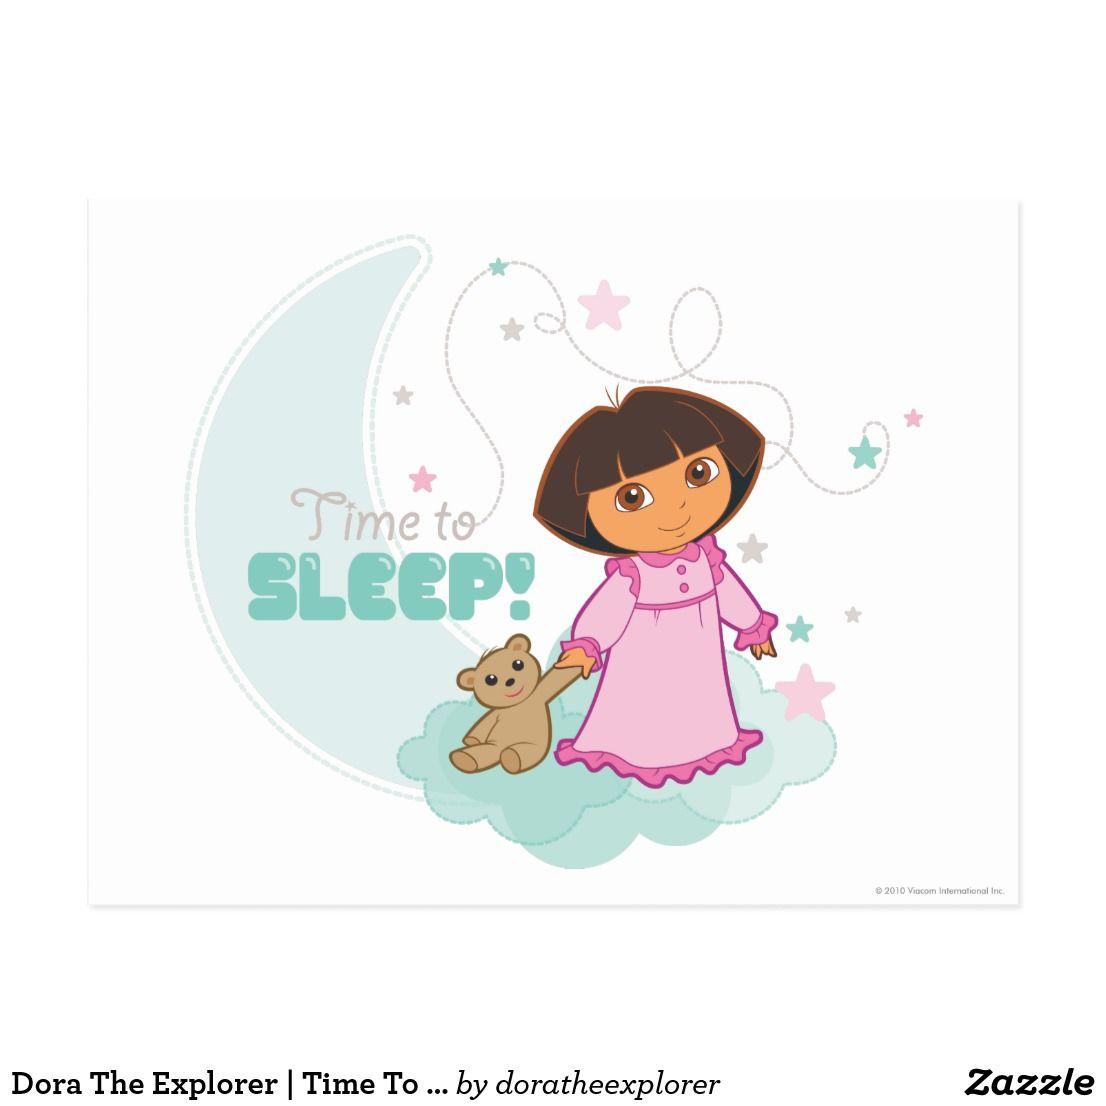 Dora The Explorer Time To Sleep Thank You Cards From Kids Dora The Explorer Dora [ 1106 x 1106 Pixel ]